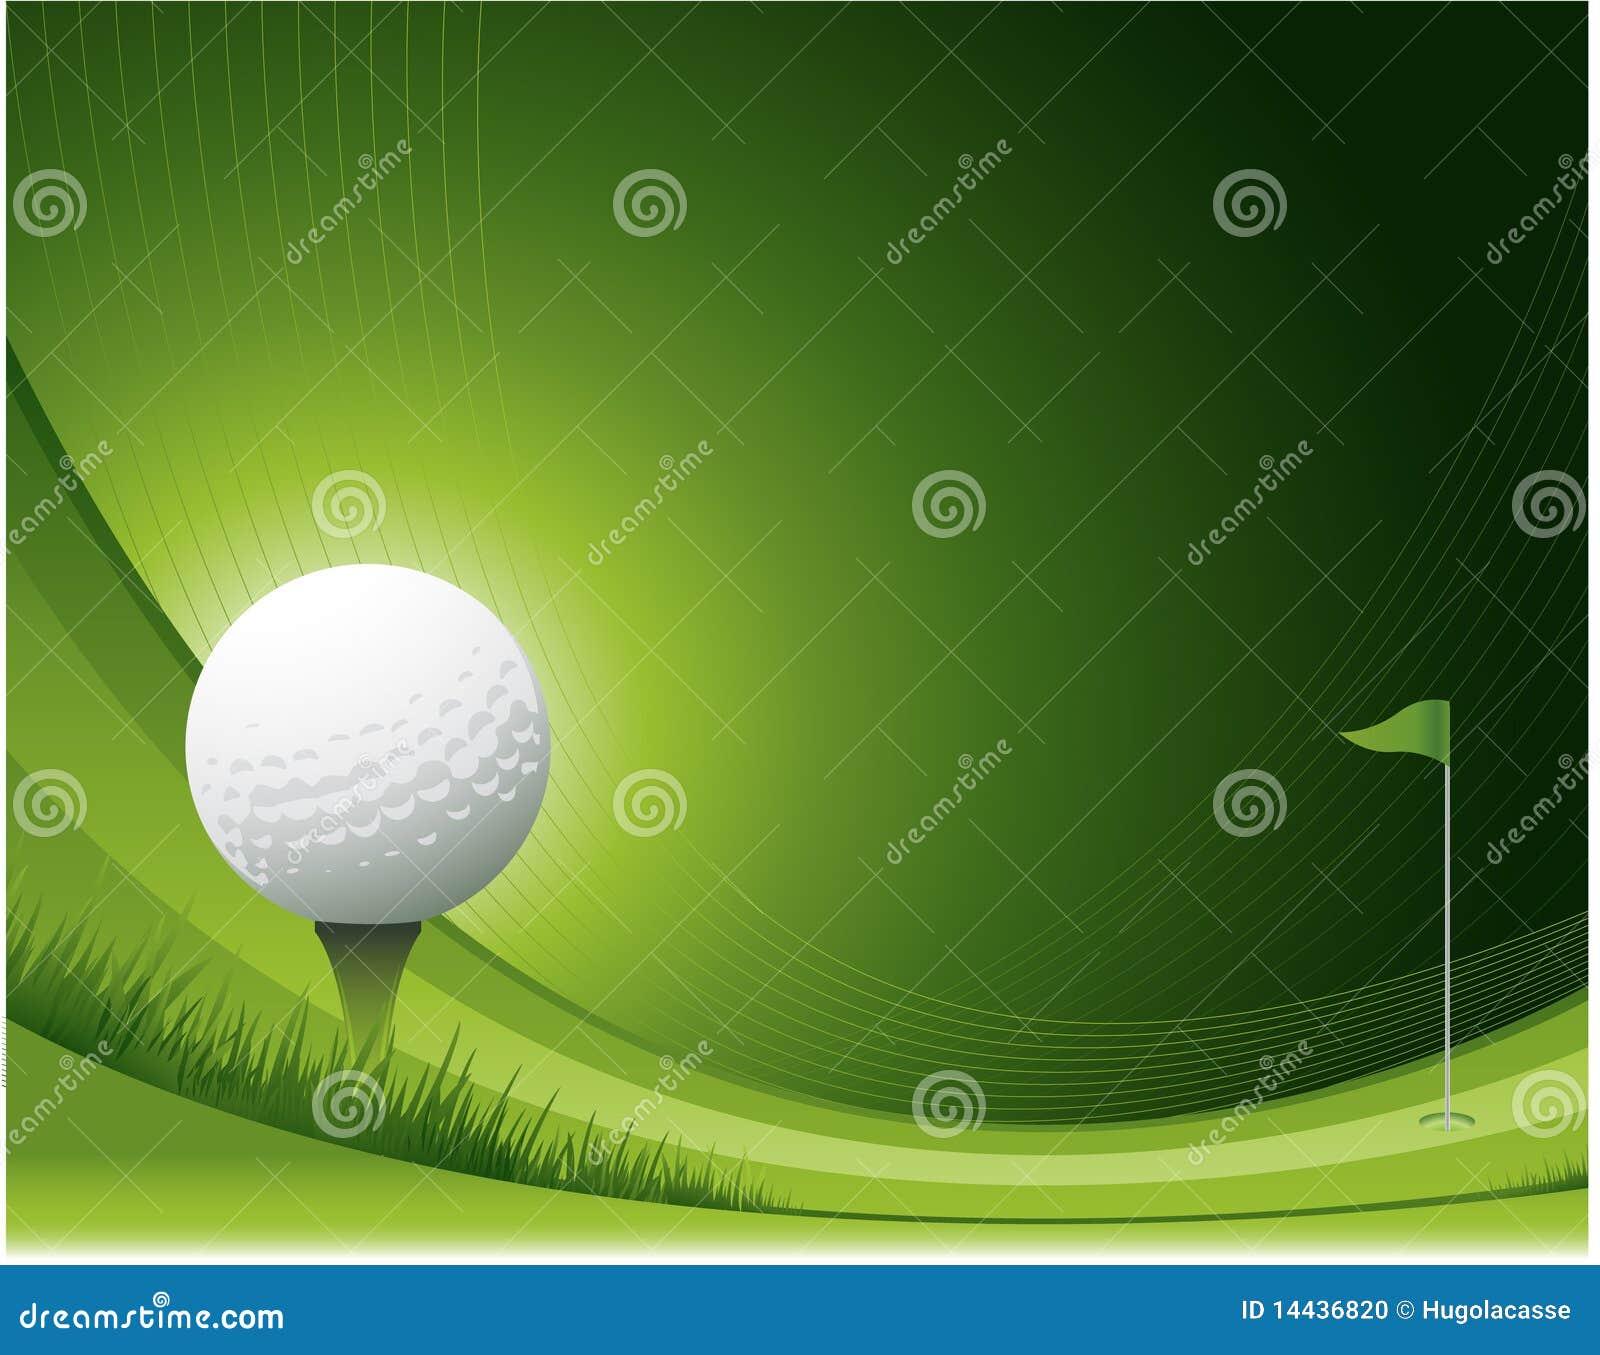 Waving Golf Design Stock Photo Image 14436820